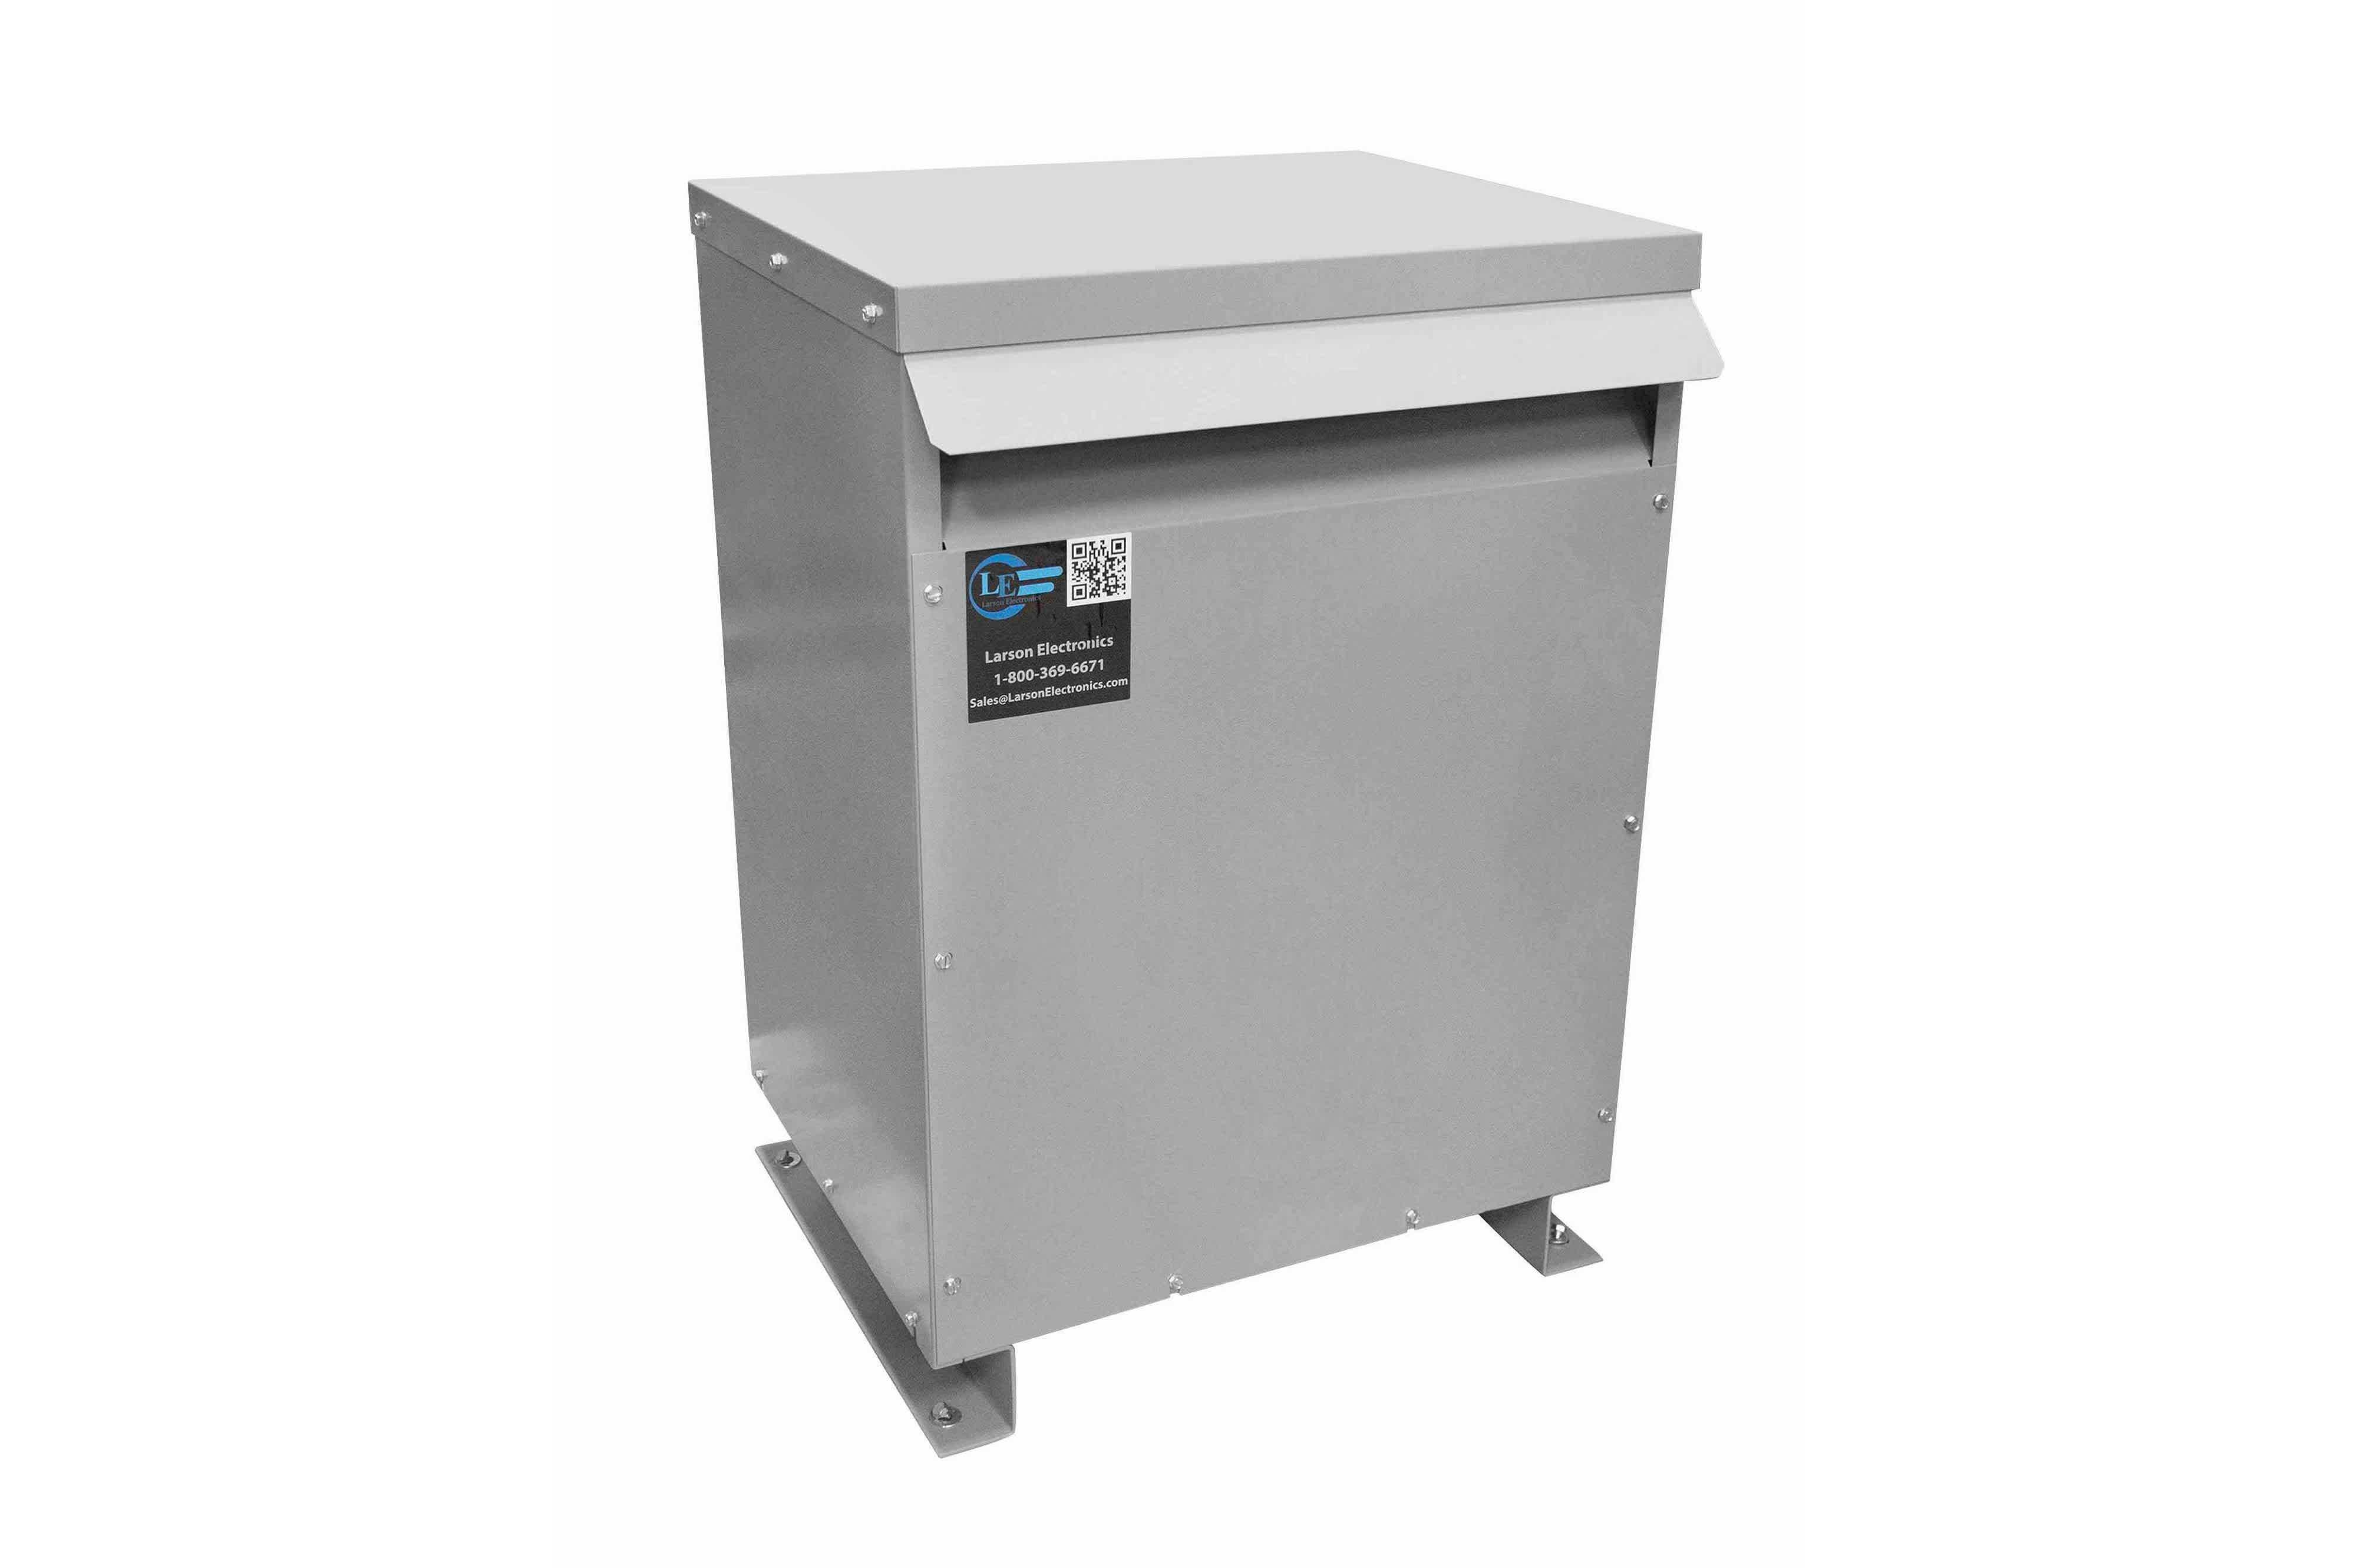 200 kVA 3PH DOE Transformer, 208V Delta Primary, 415Y/240 Wye-N Secondary, N3R, Ventilated, 60 Hz